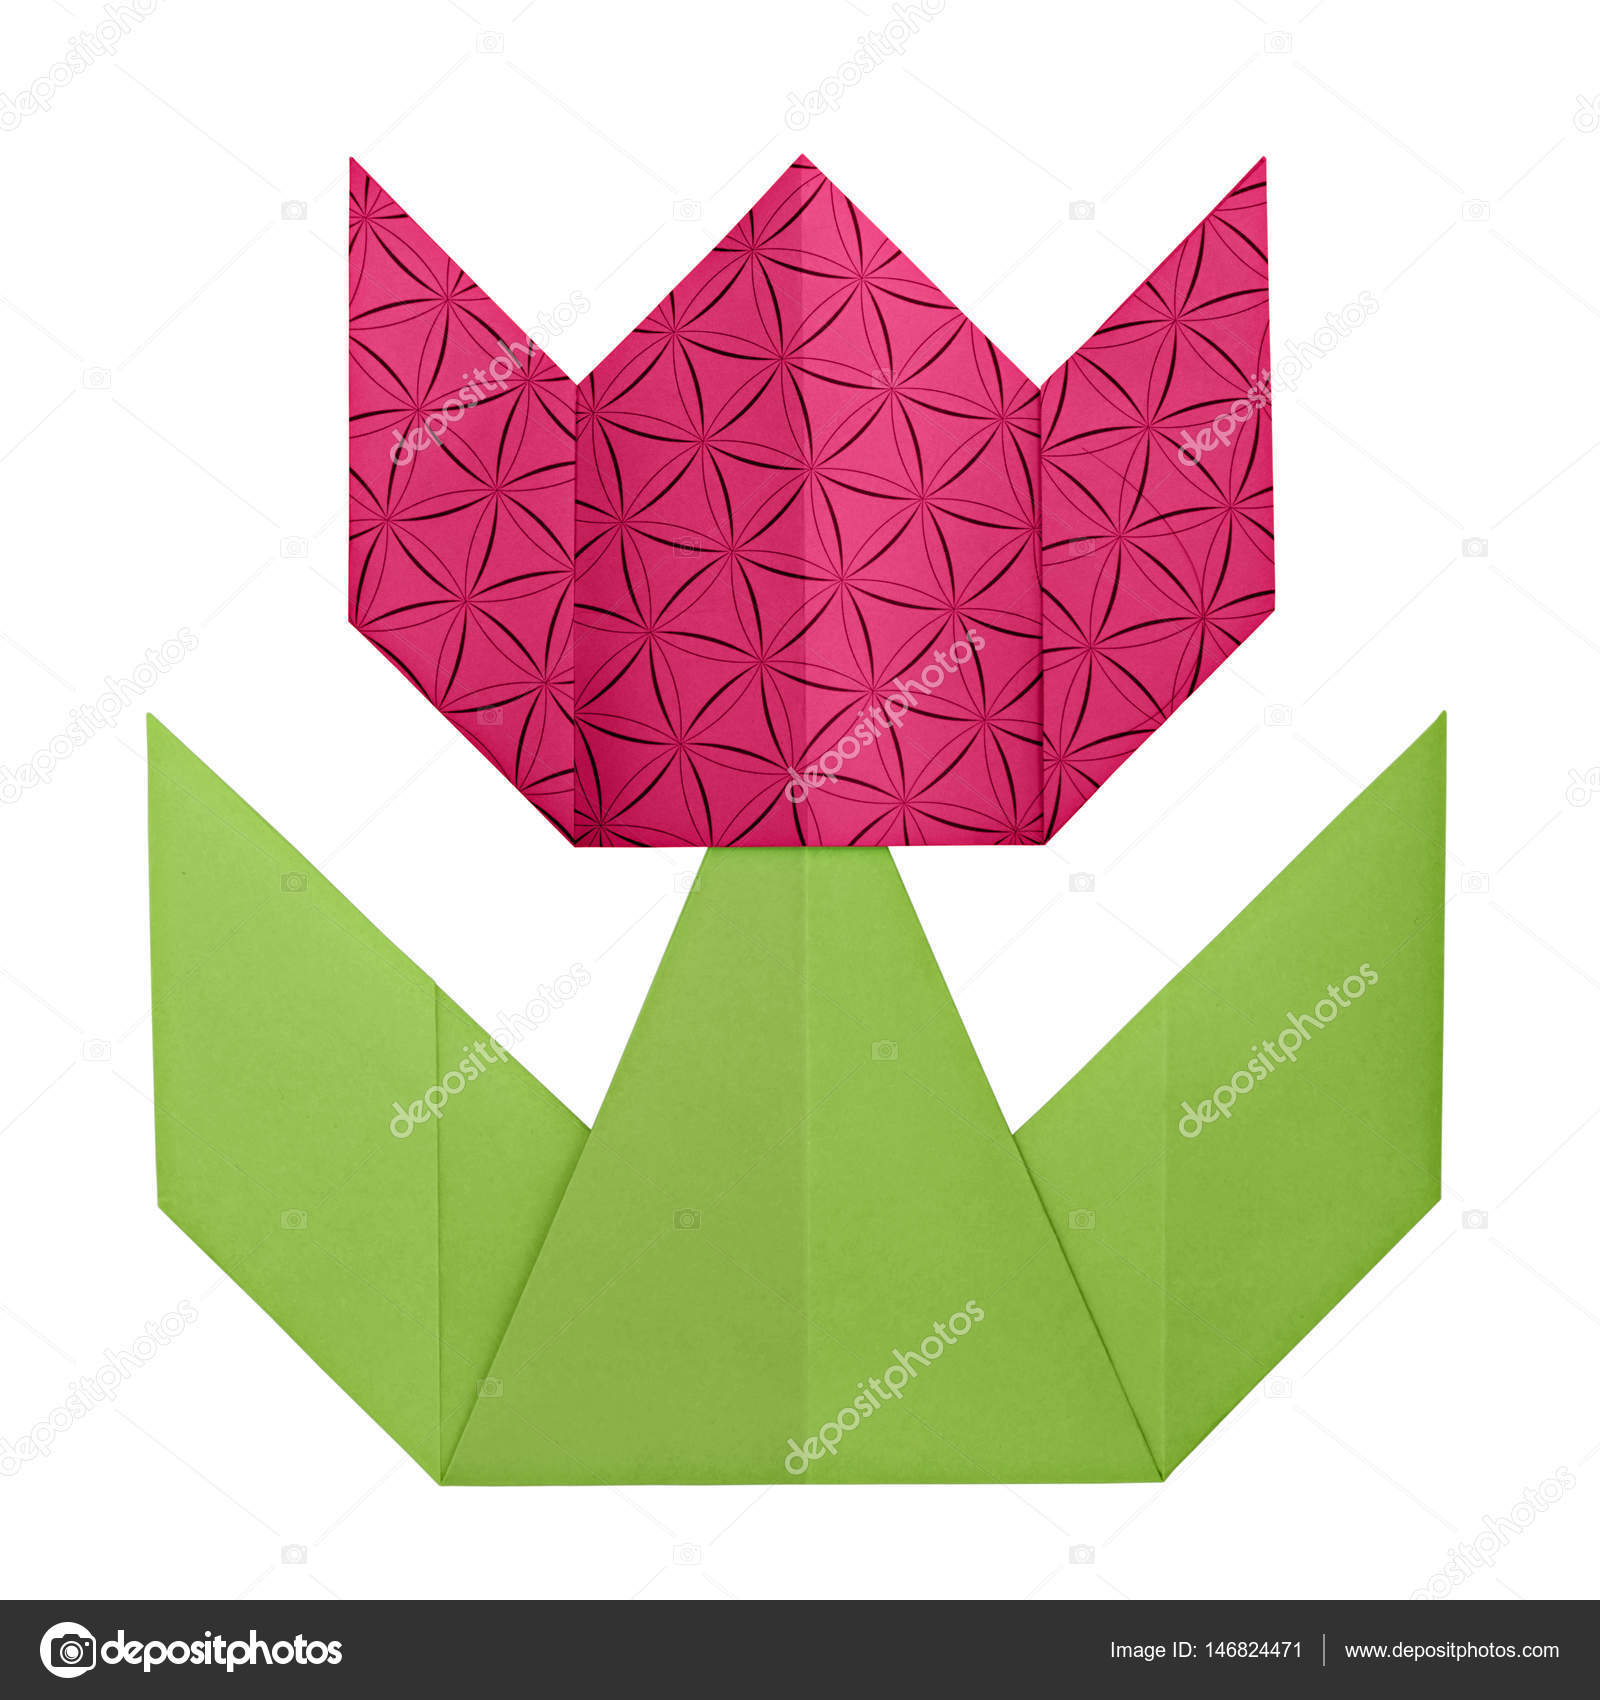 Origami tulip flower craft - Make stunning paper flowers ... | 1700x1600